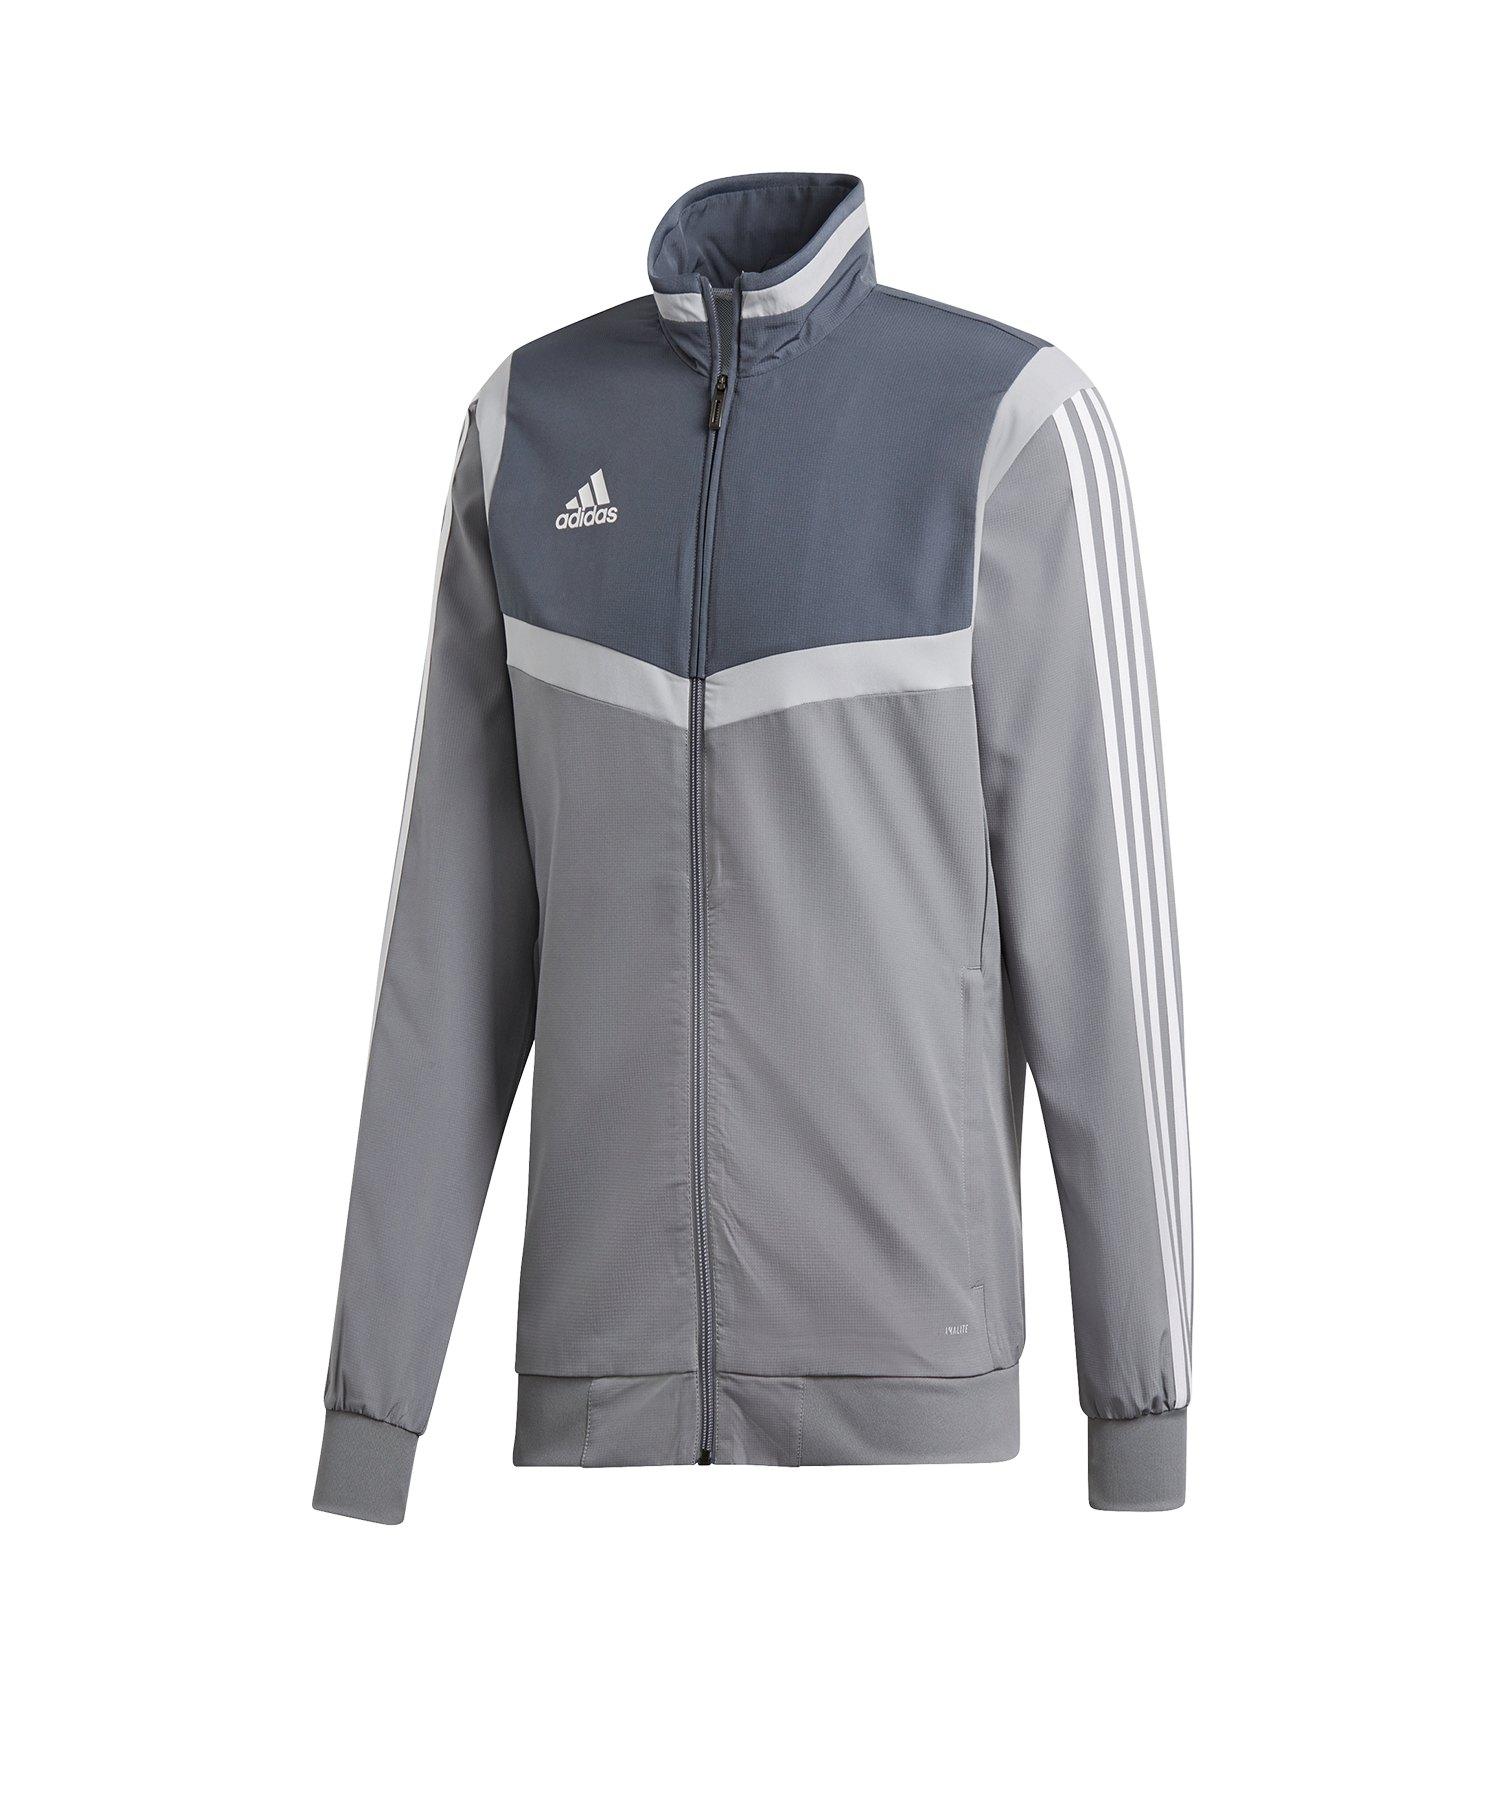 Teamsport 24 7 eShop | Adidas Tiro 19 Polyester Jacket